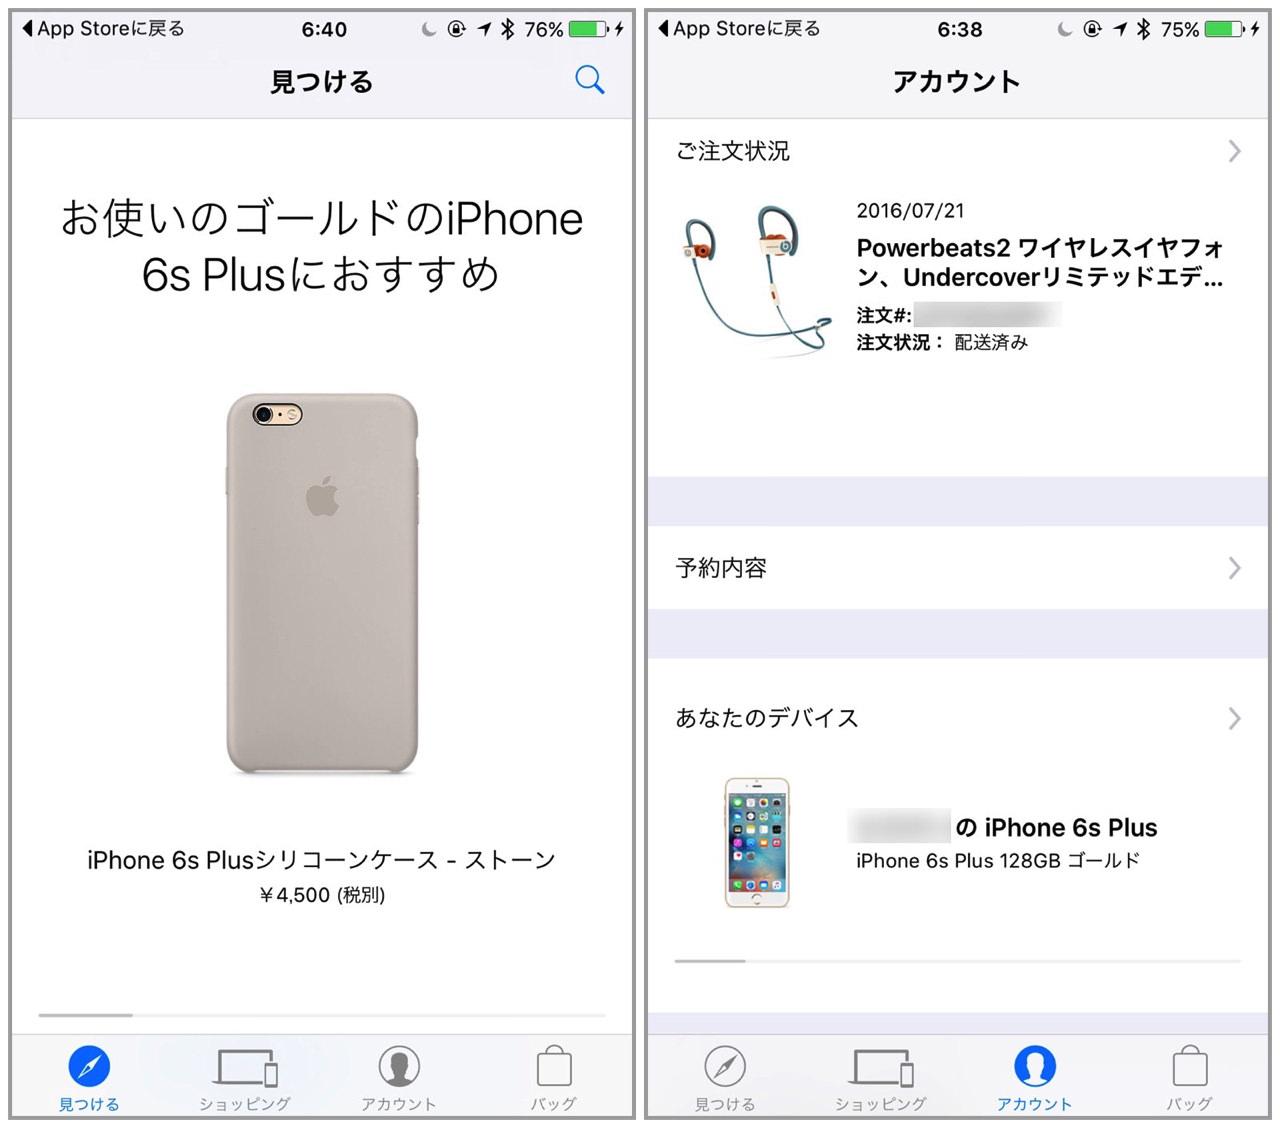 Apple store version 41